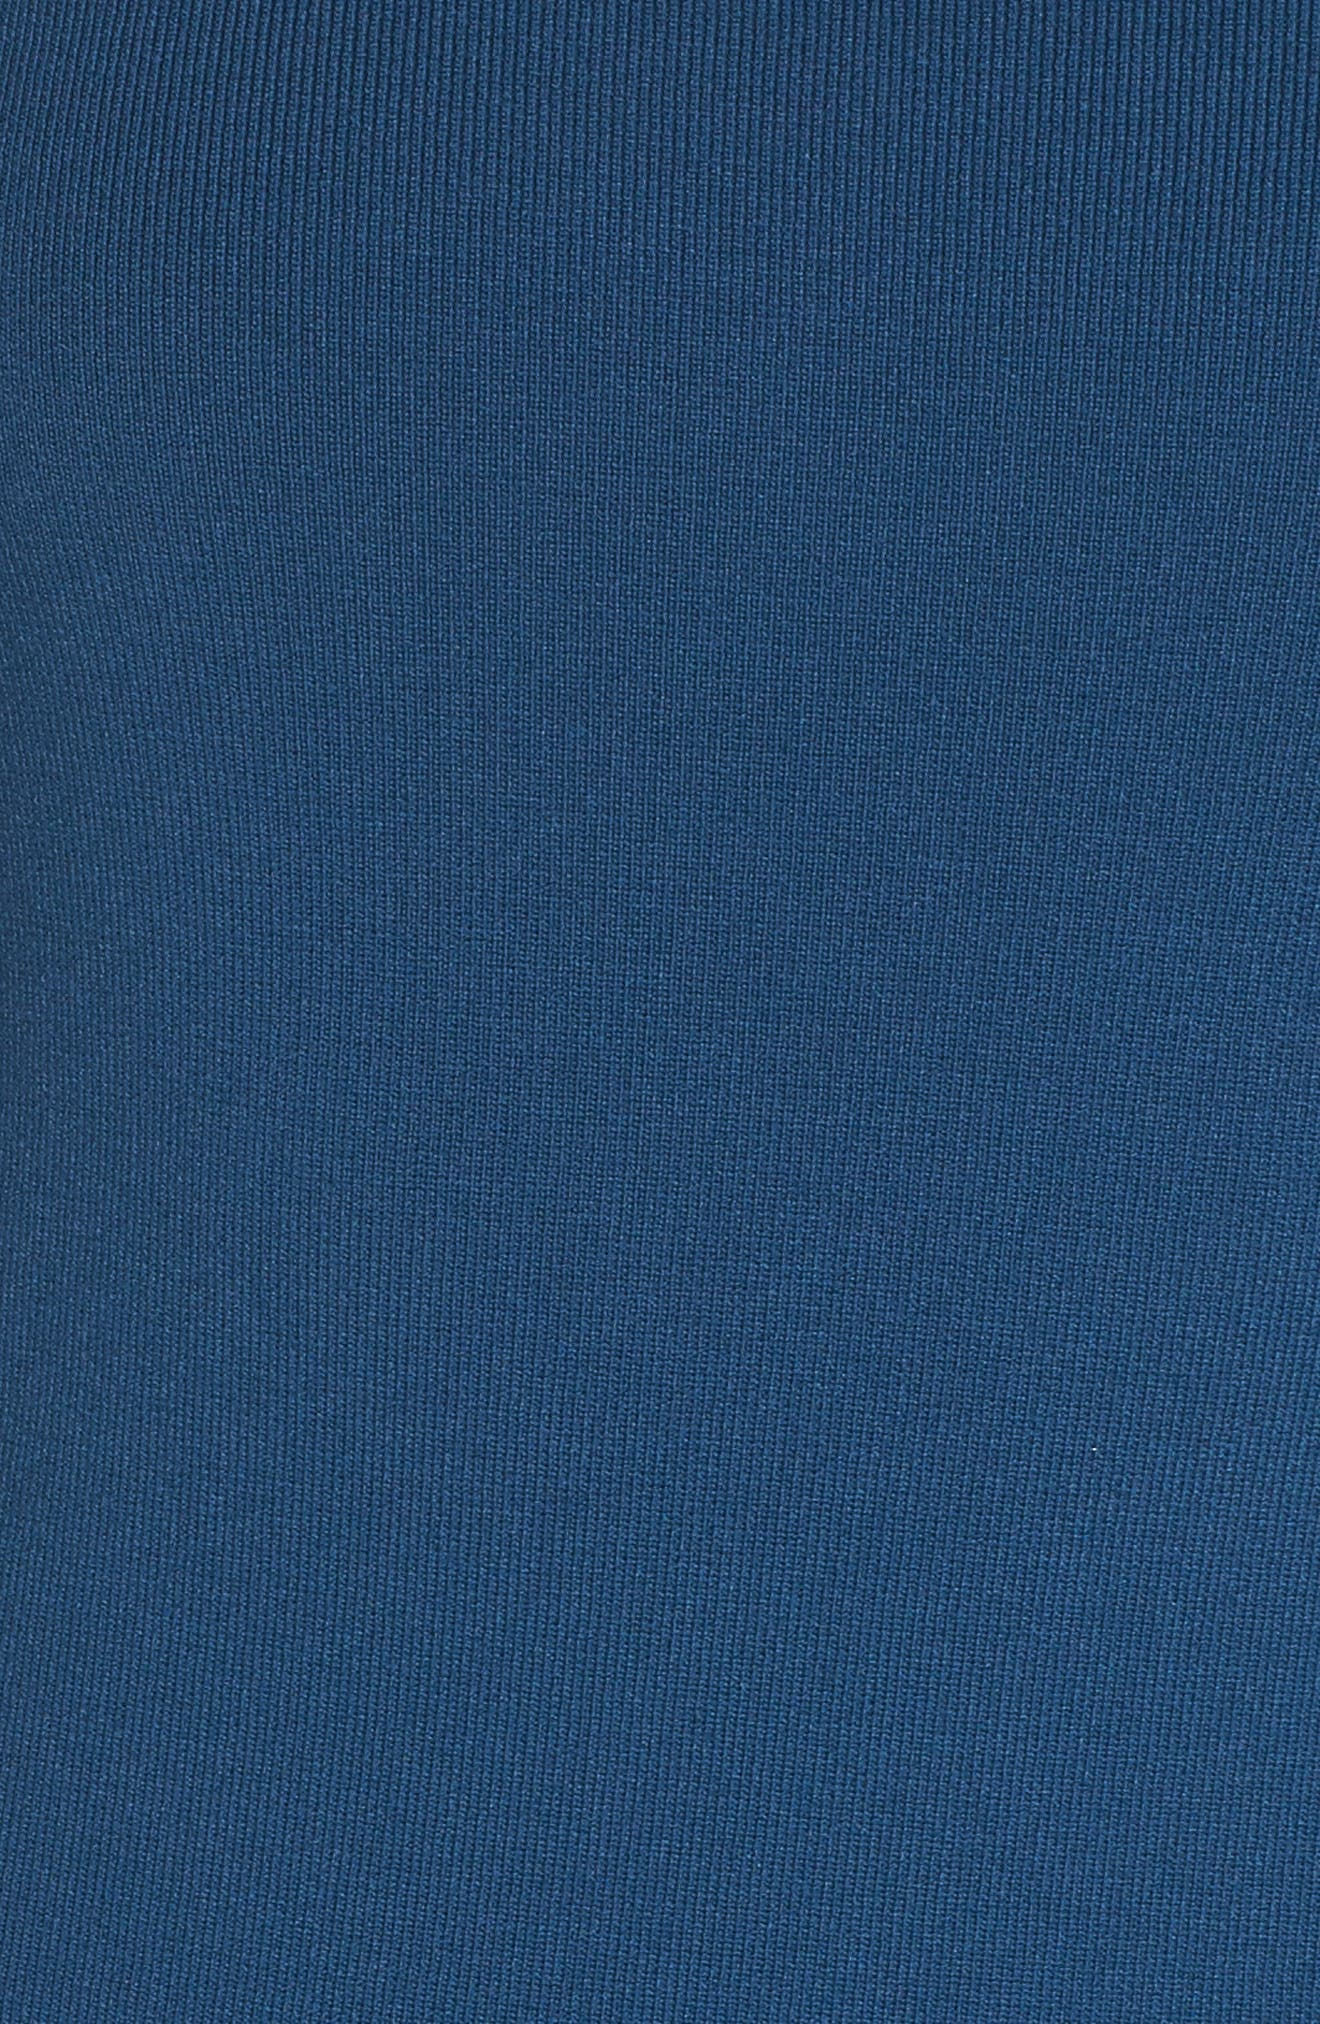 Studded Asymmetrical Dress,                             Alternate thumbnail 10, color,